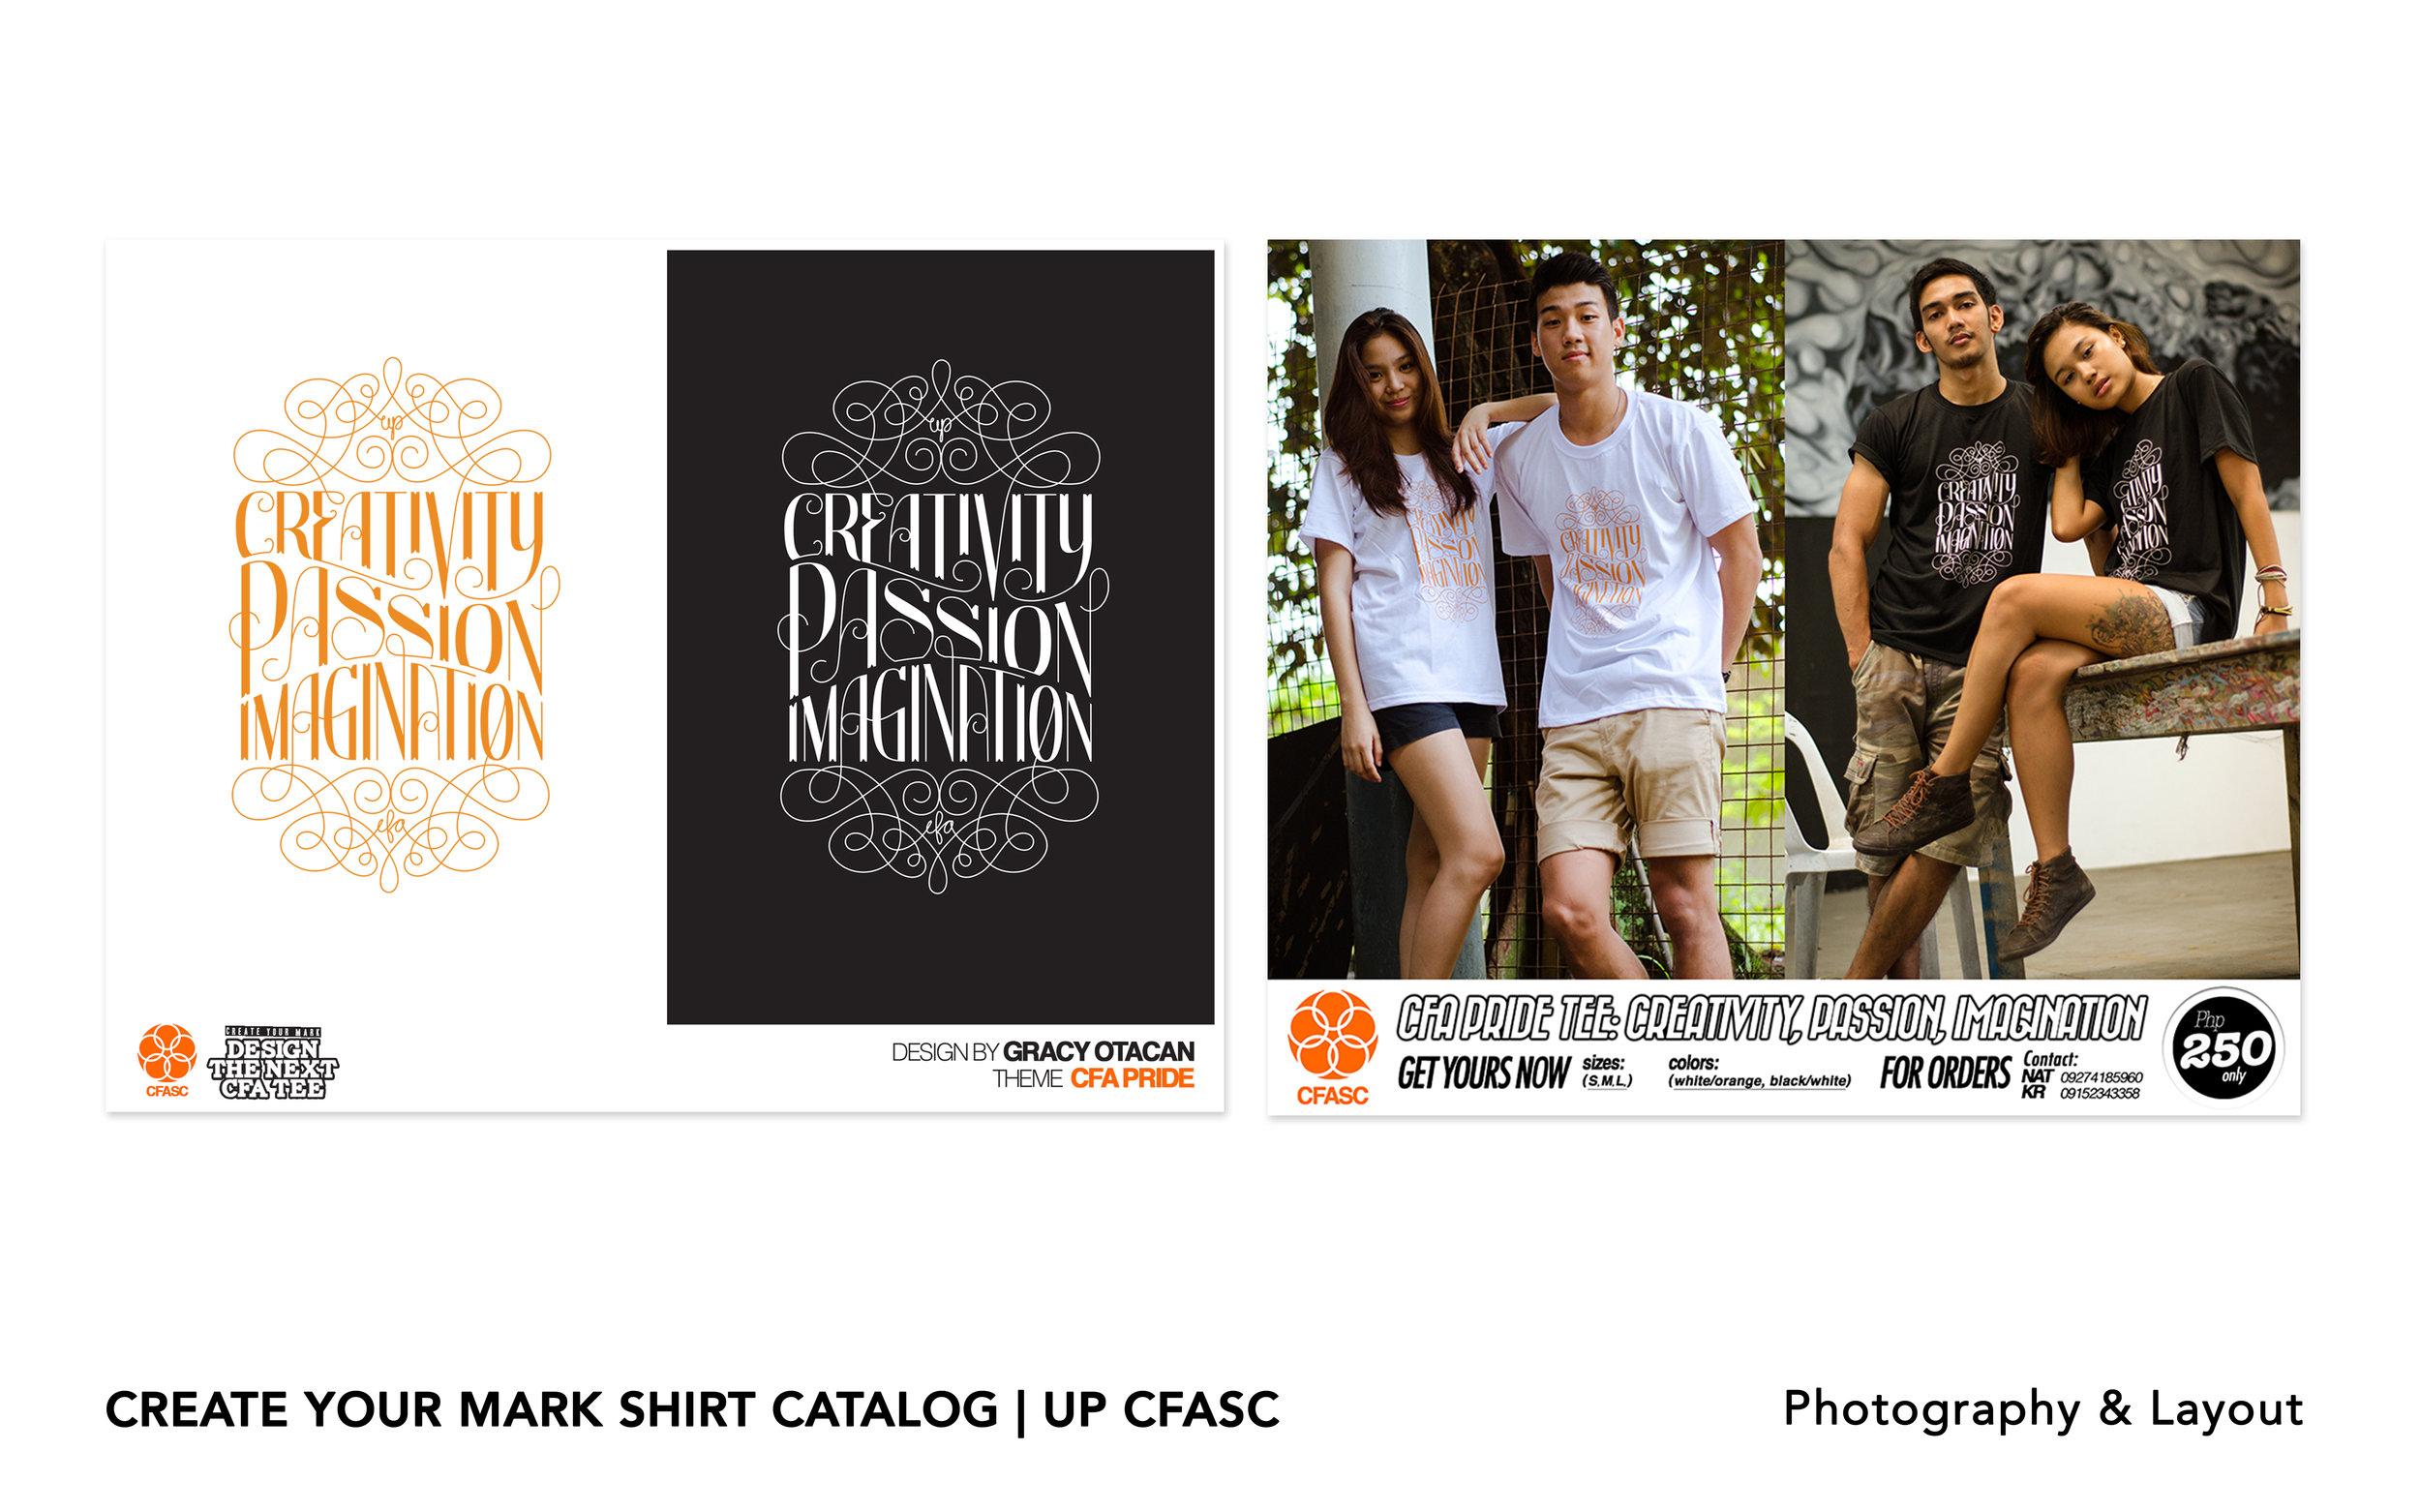 03 Create Your Mark Shirt Catalog.jpg